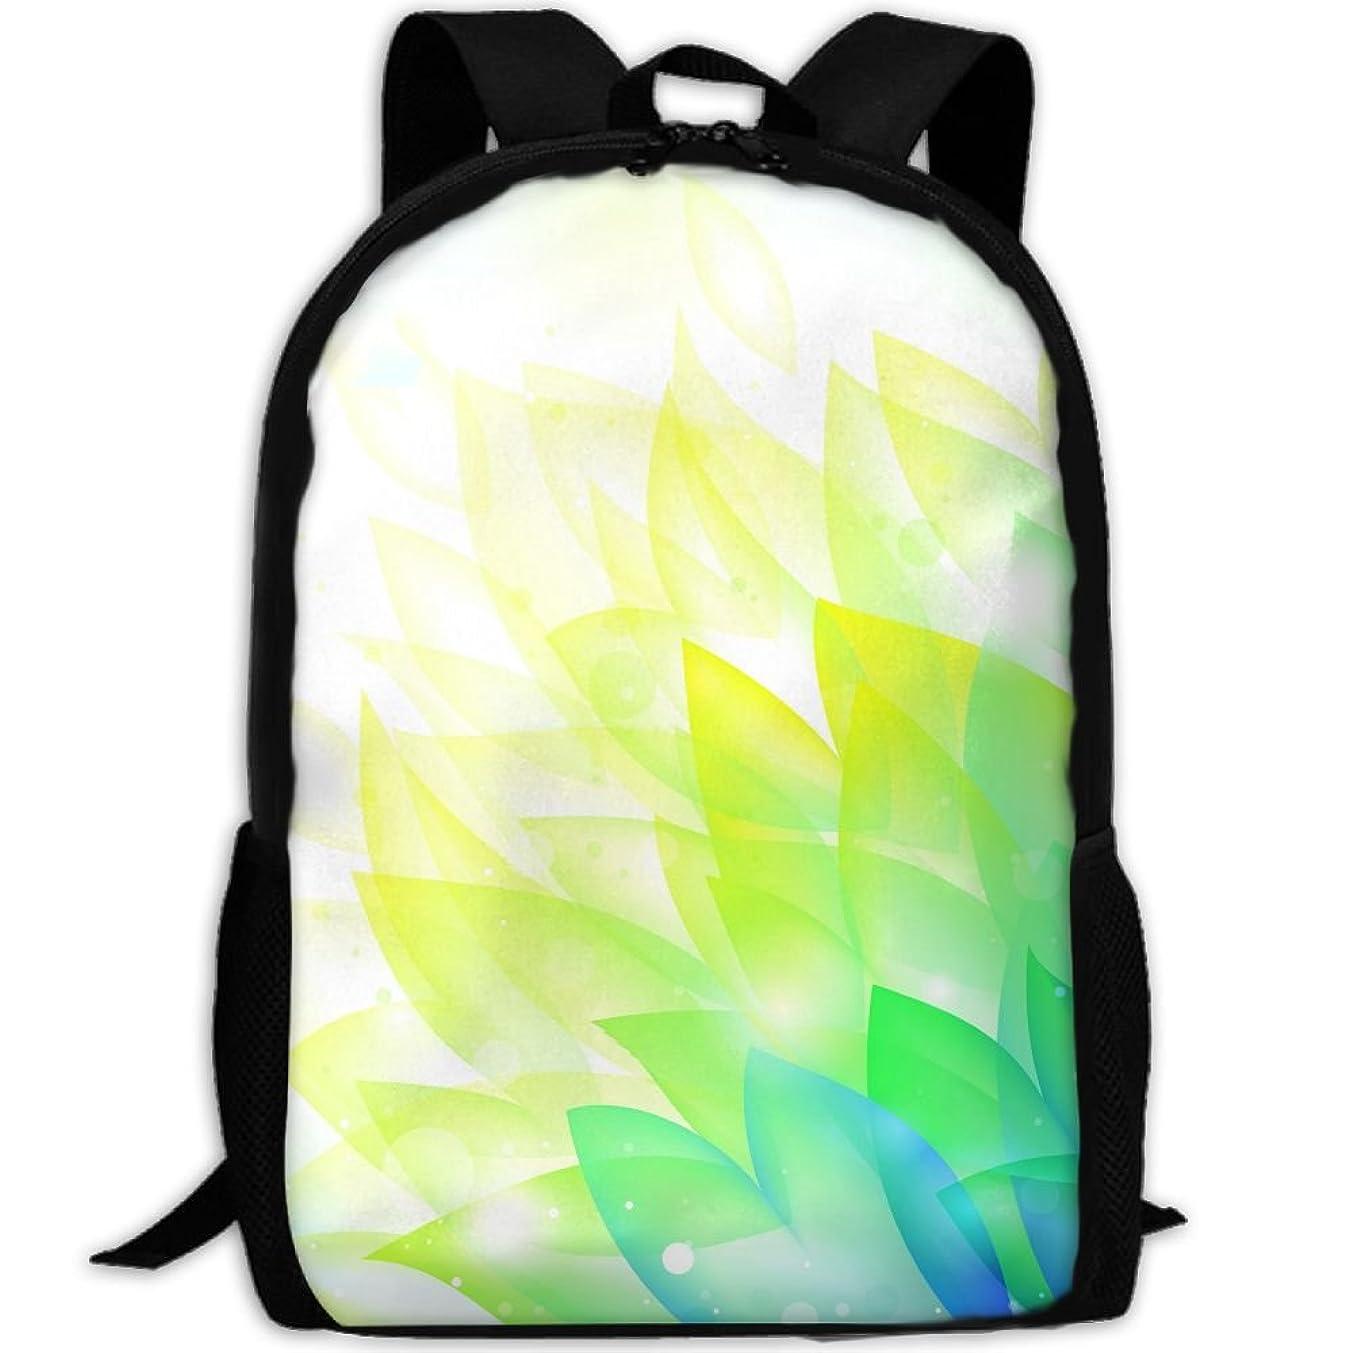 Webb Backpack Briefcase Laptop Travel Hiking School Bags Blue Yellow Leaves Stylish Daypacks Shoulder Bag